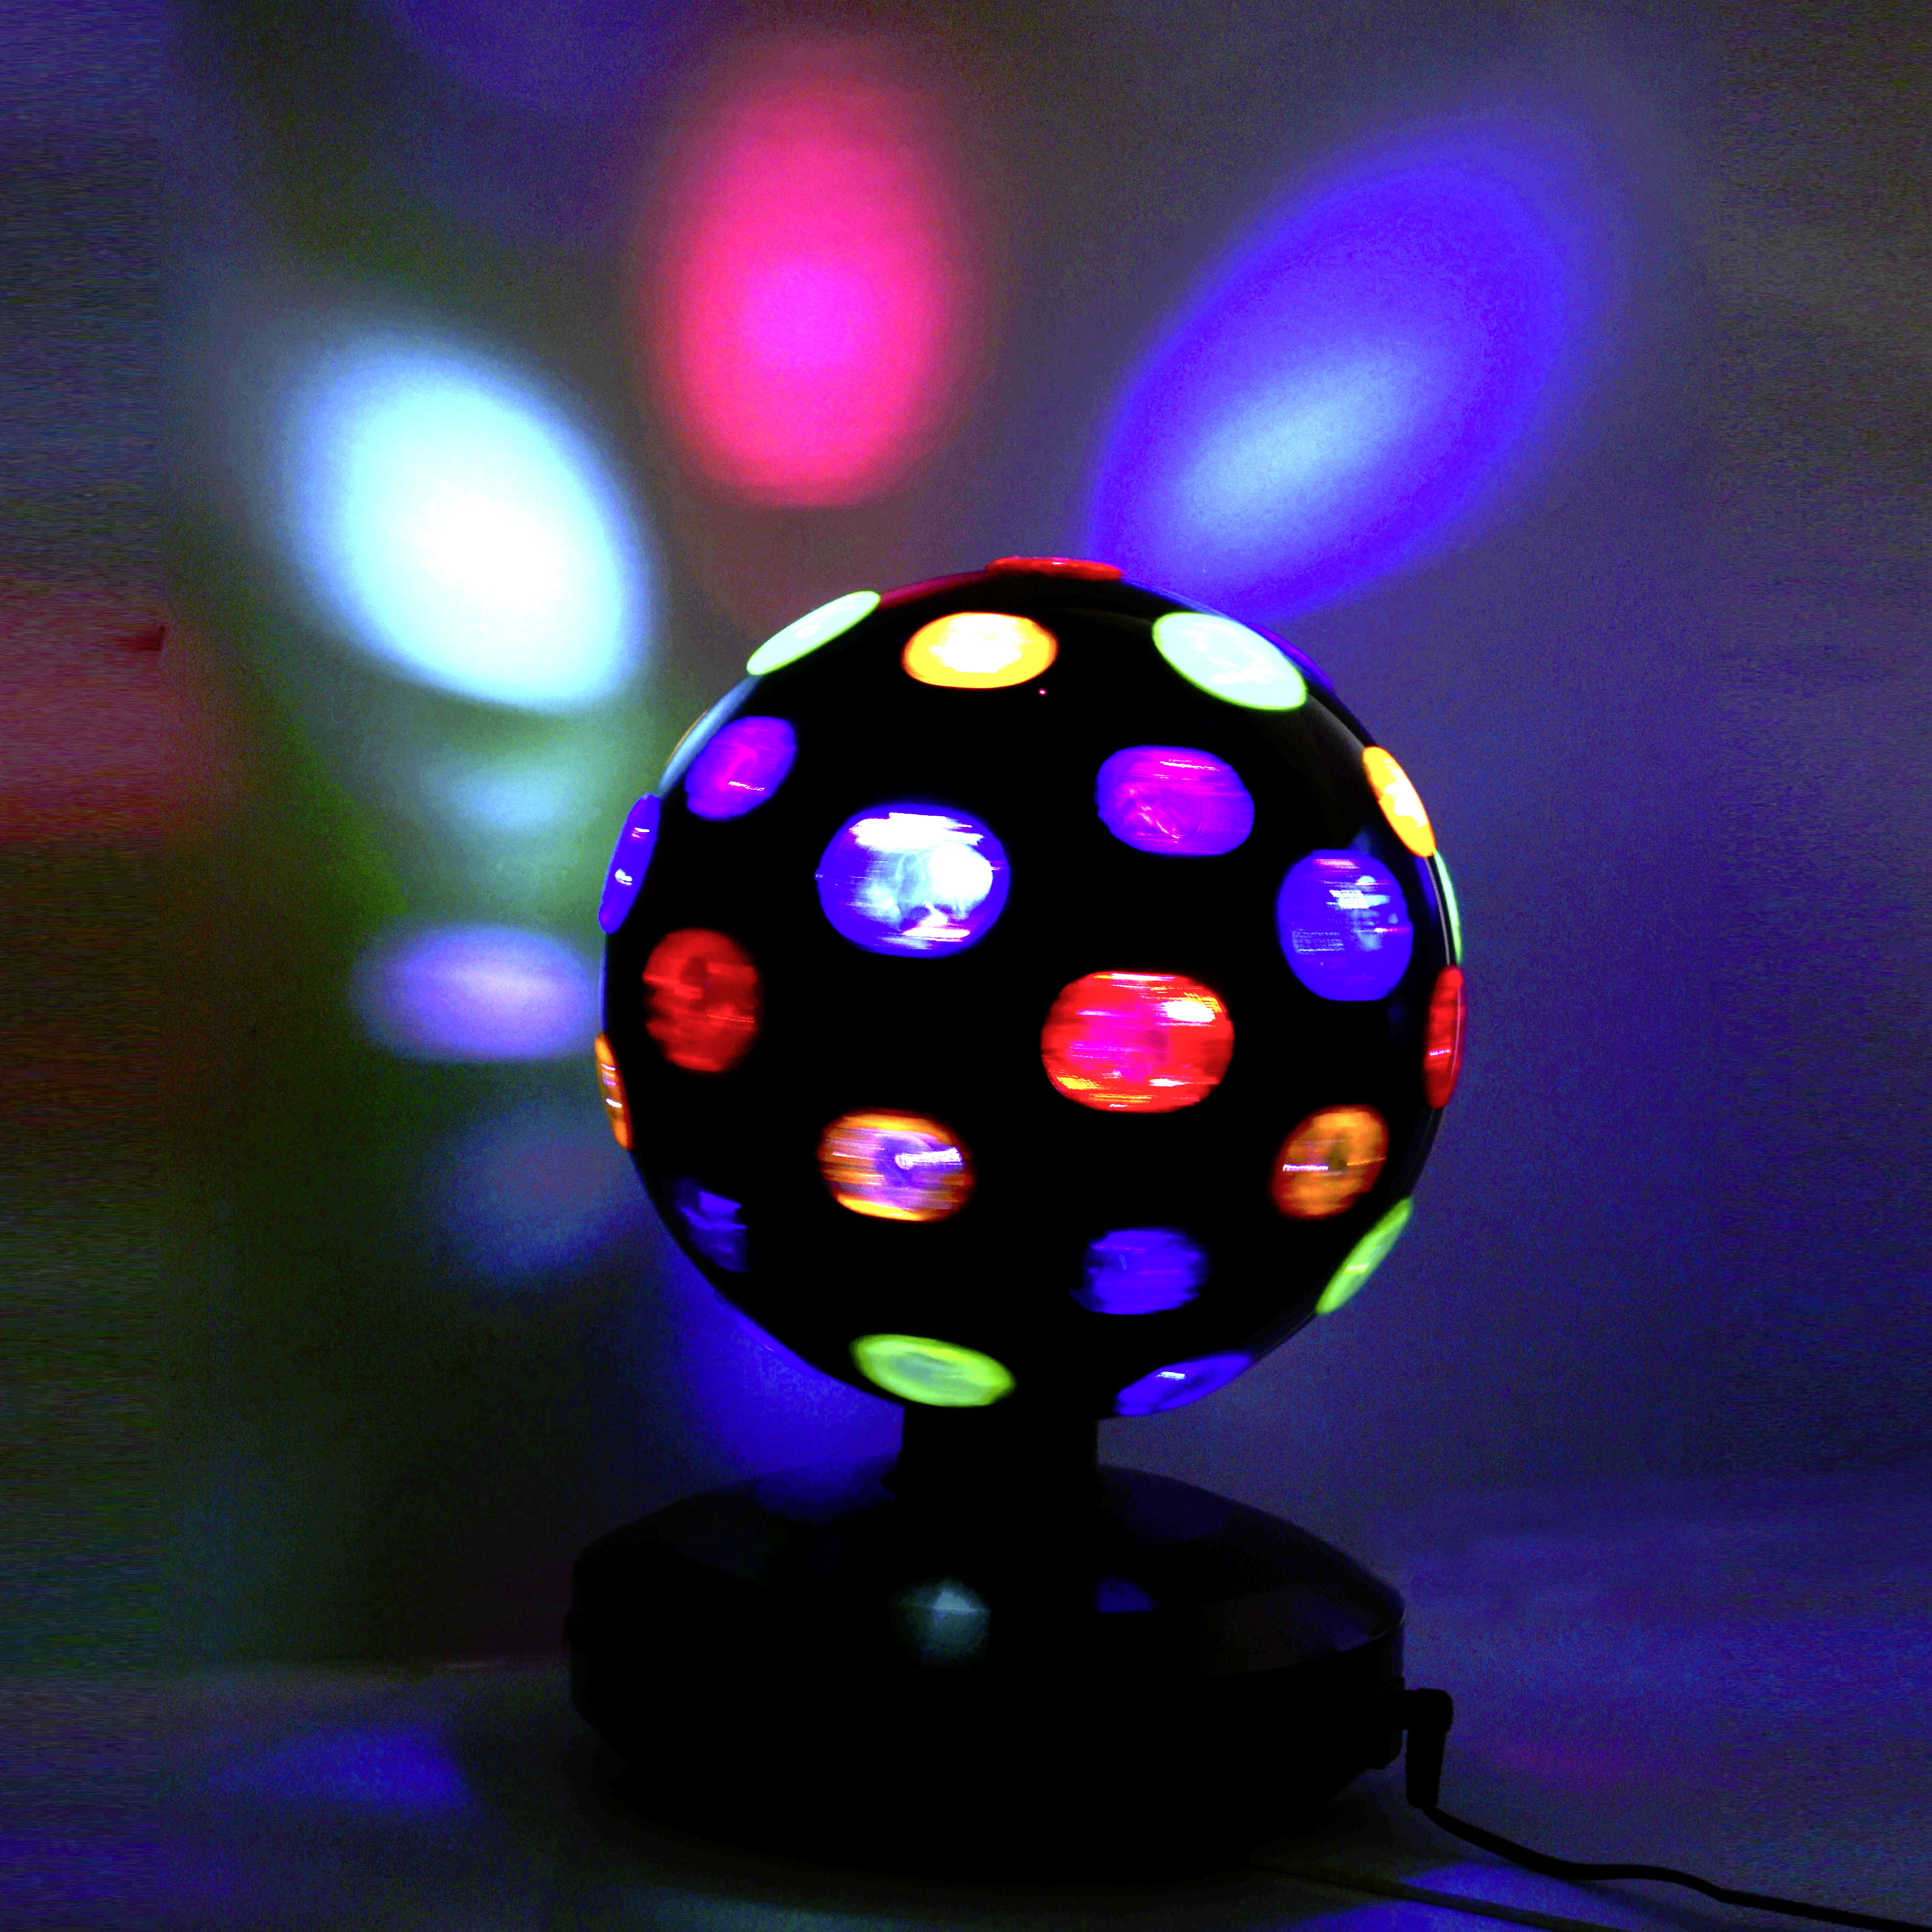 X4-LIFE Color Discokugel L Lichteffekt rotierende Partybeleuchtung farbig